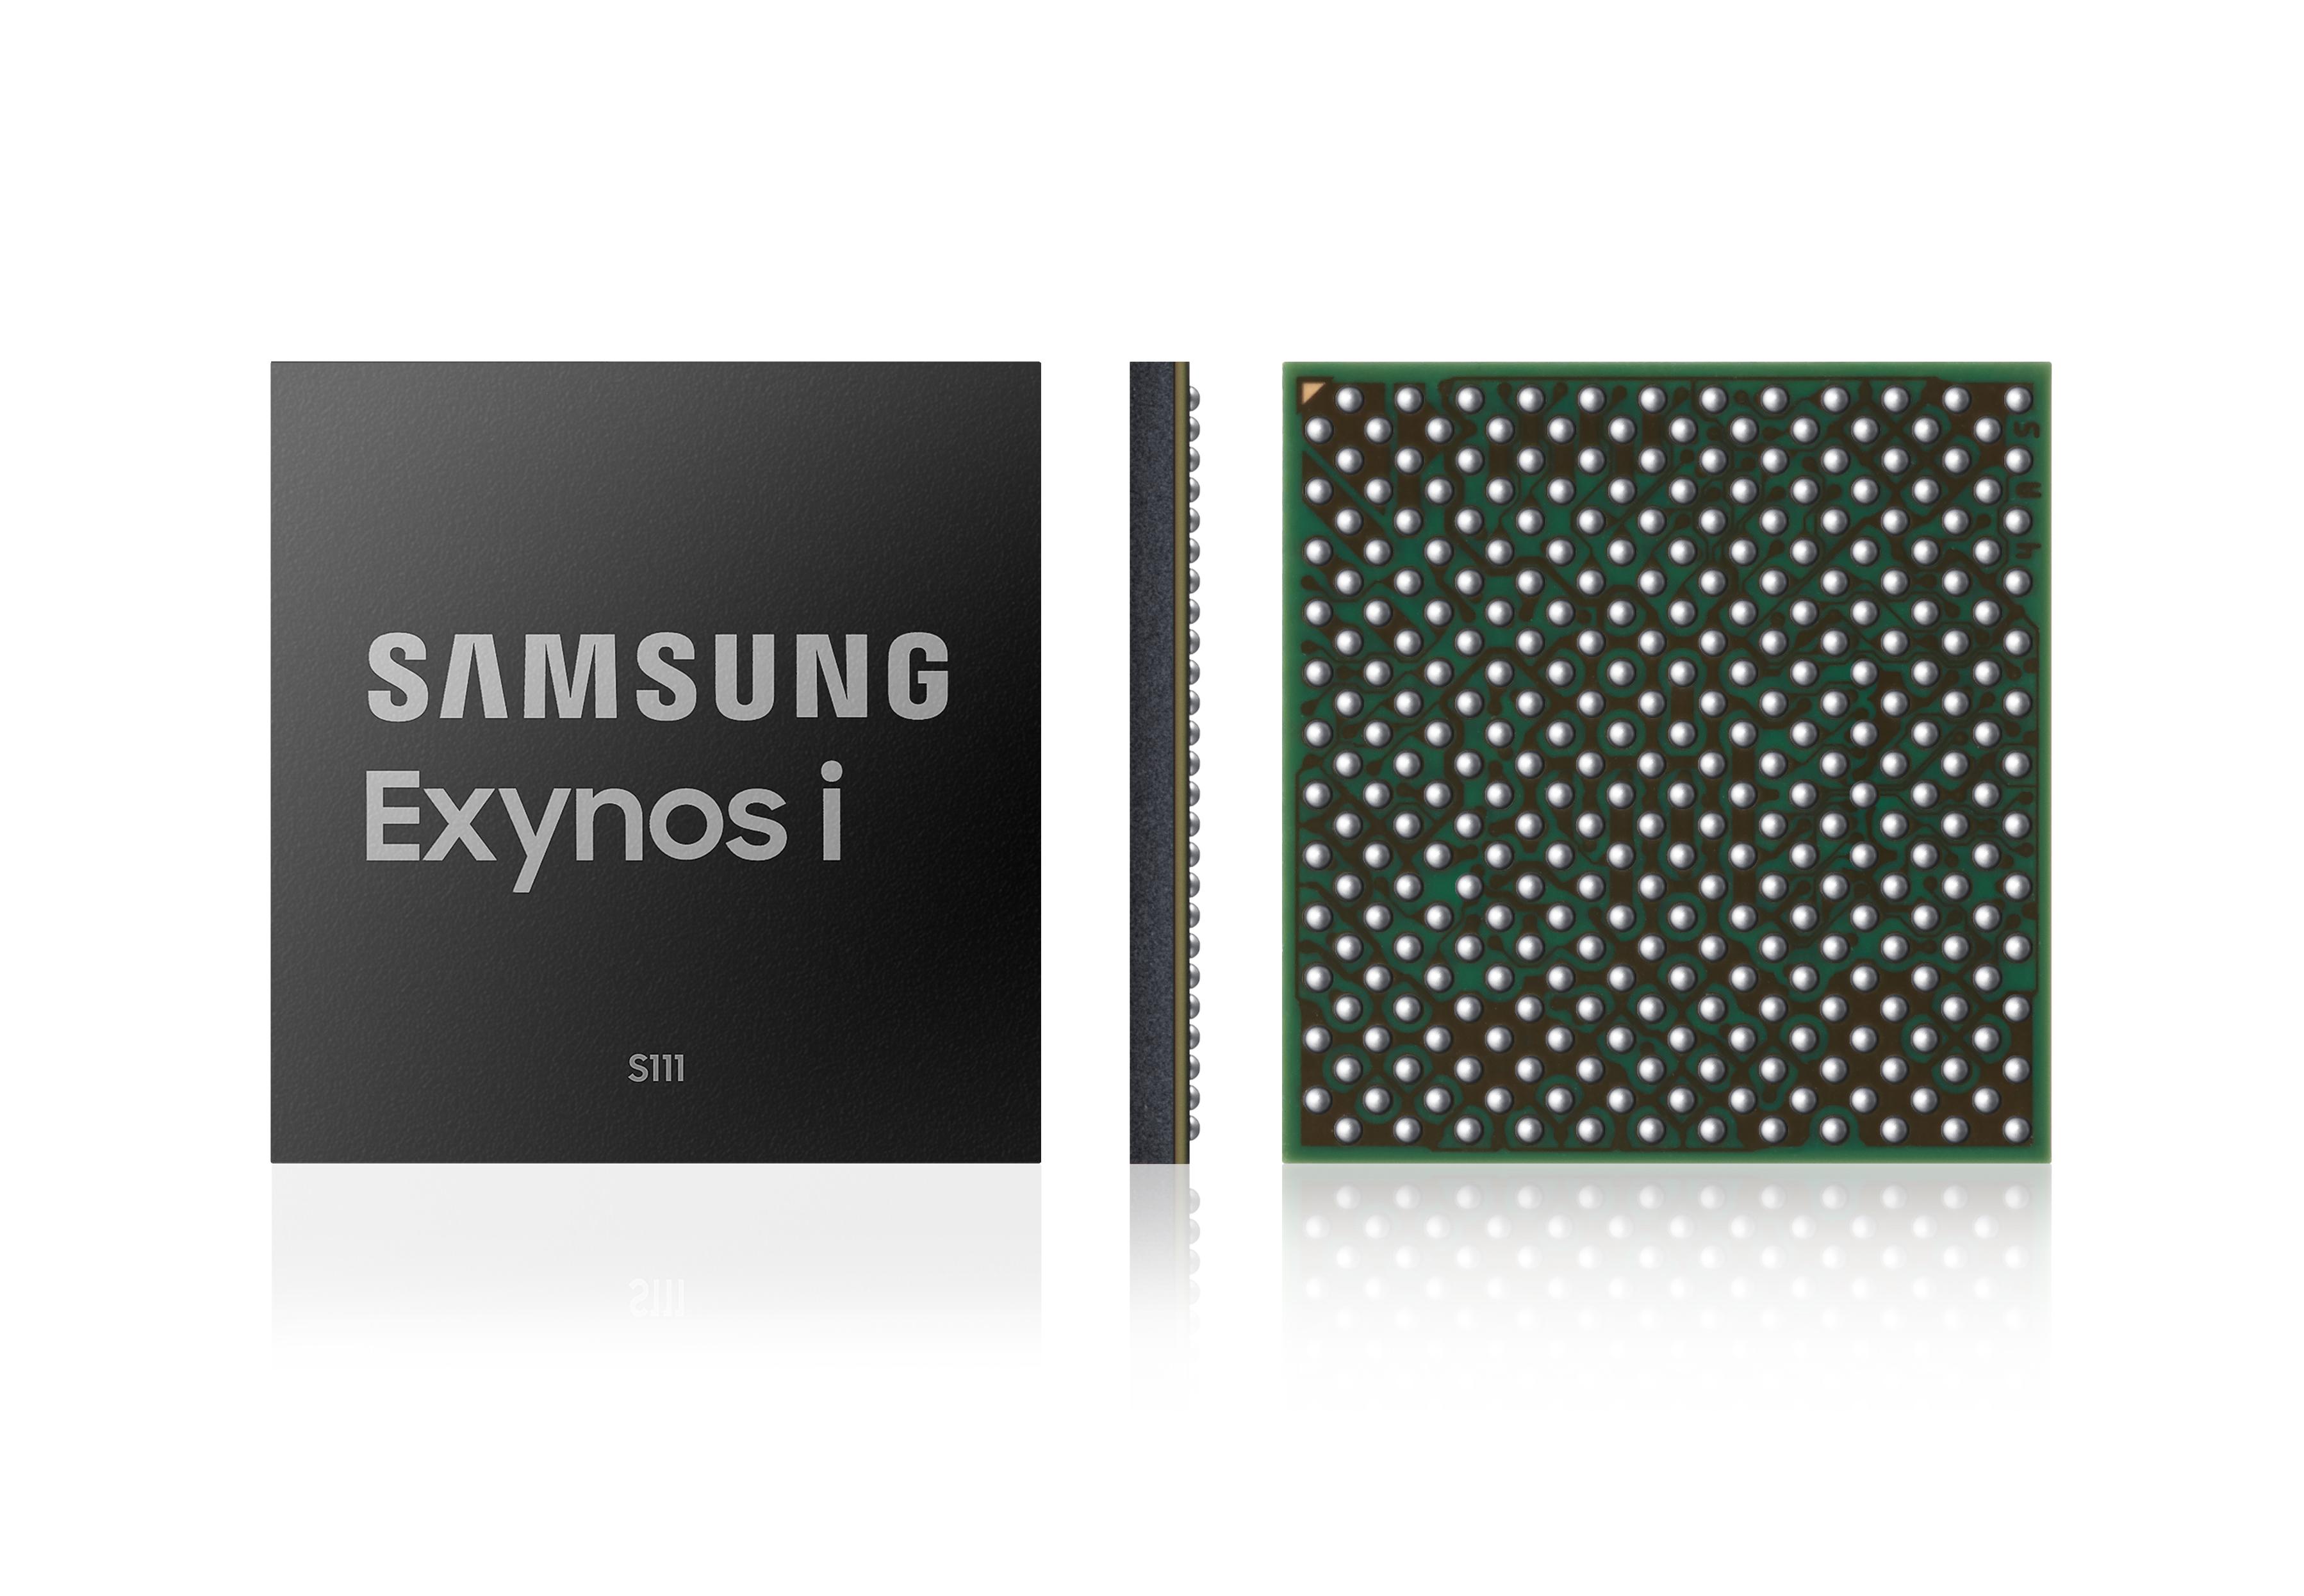 Процессор Samsung Exynos i S111